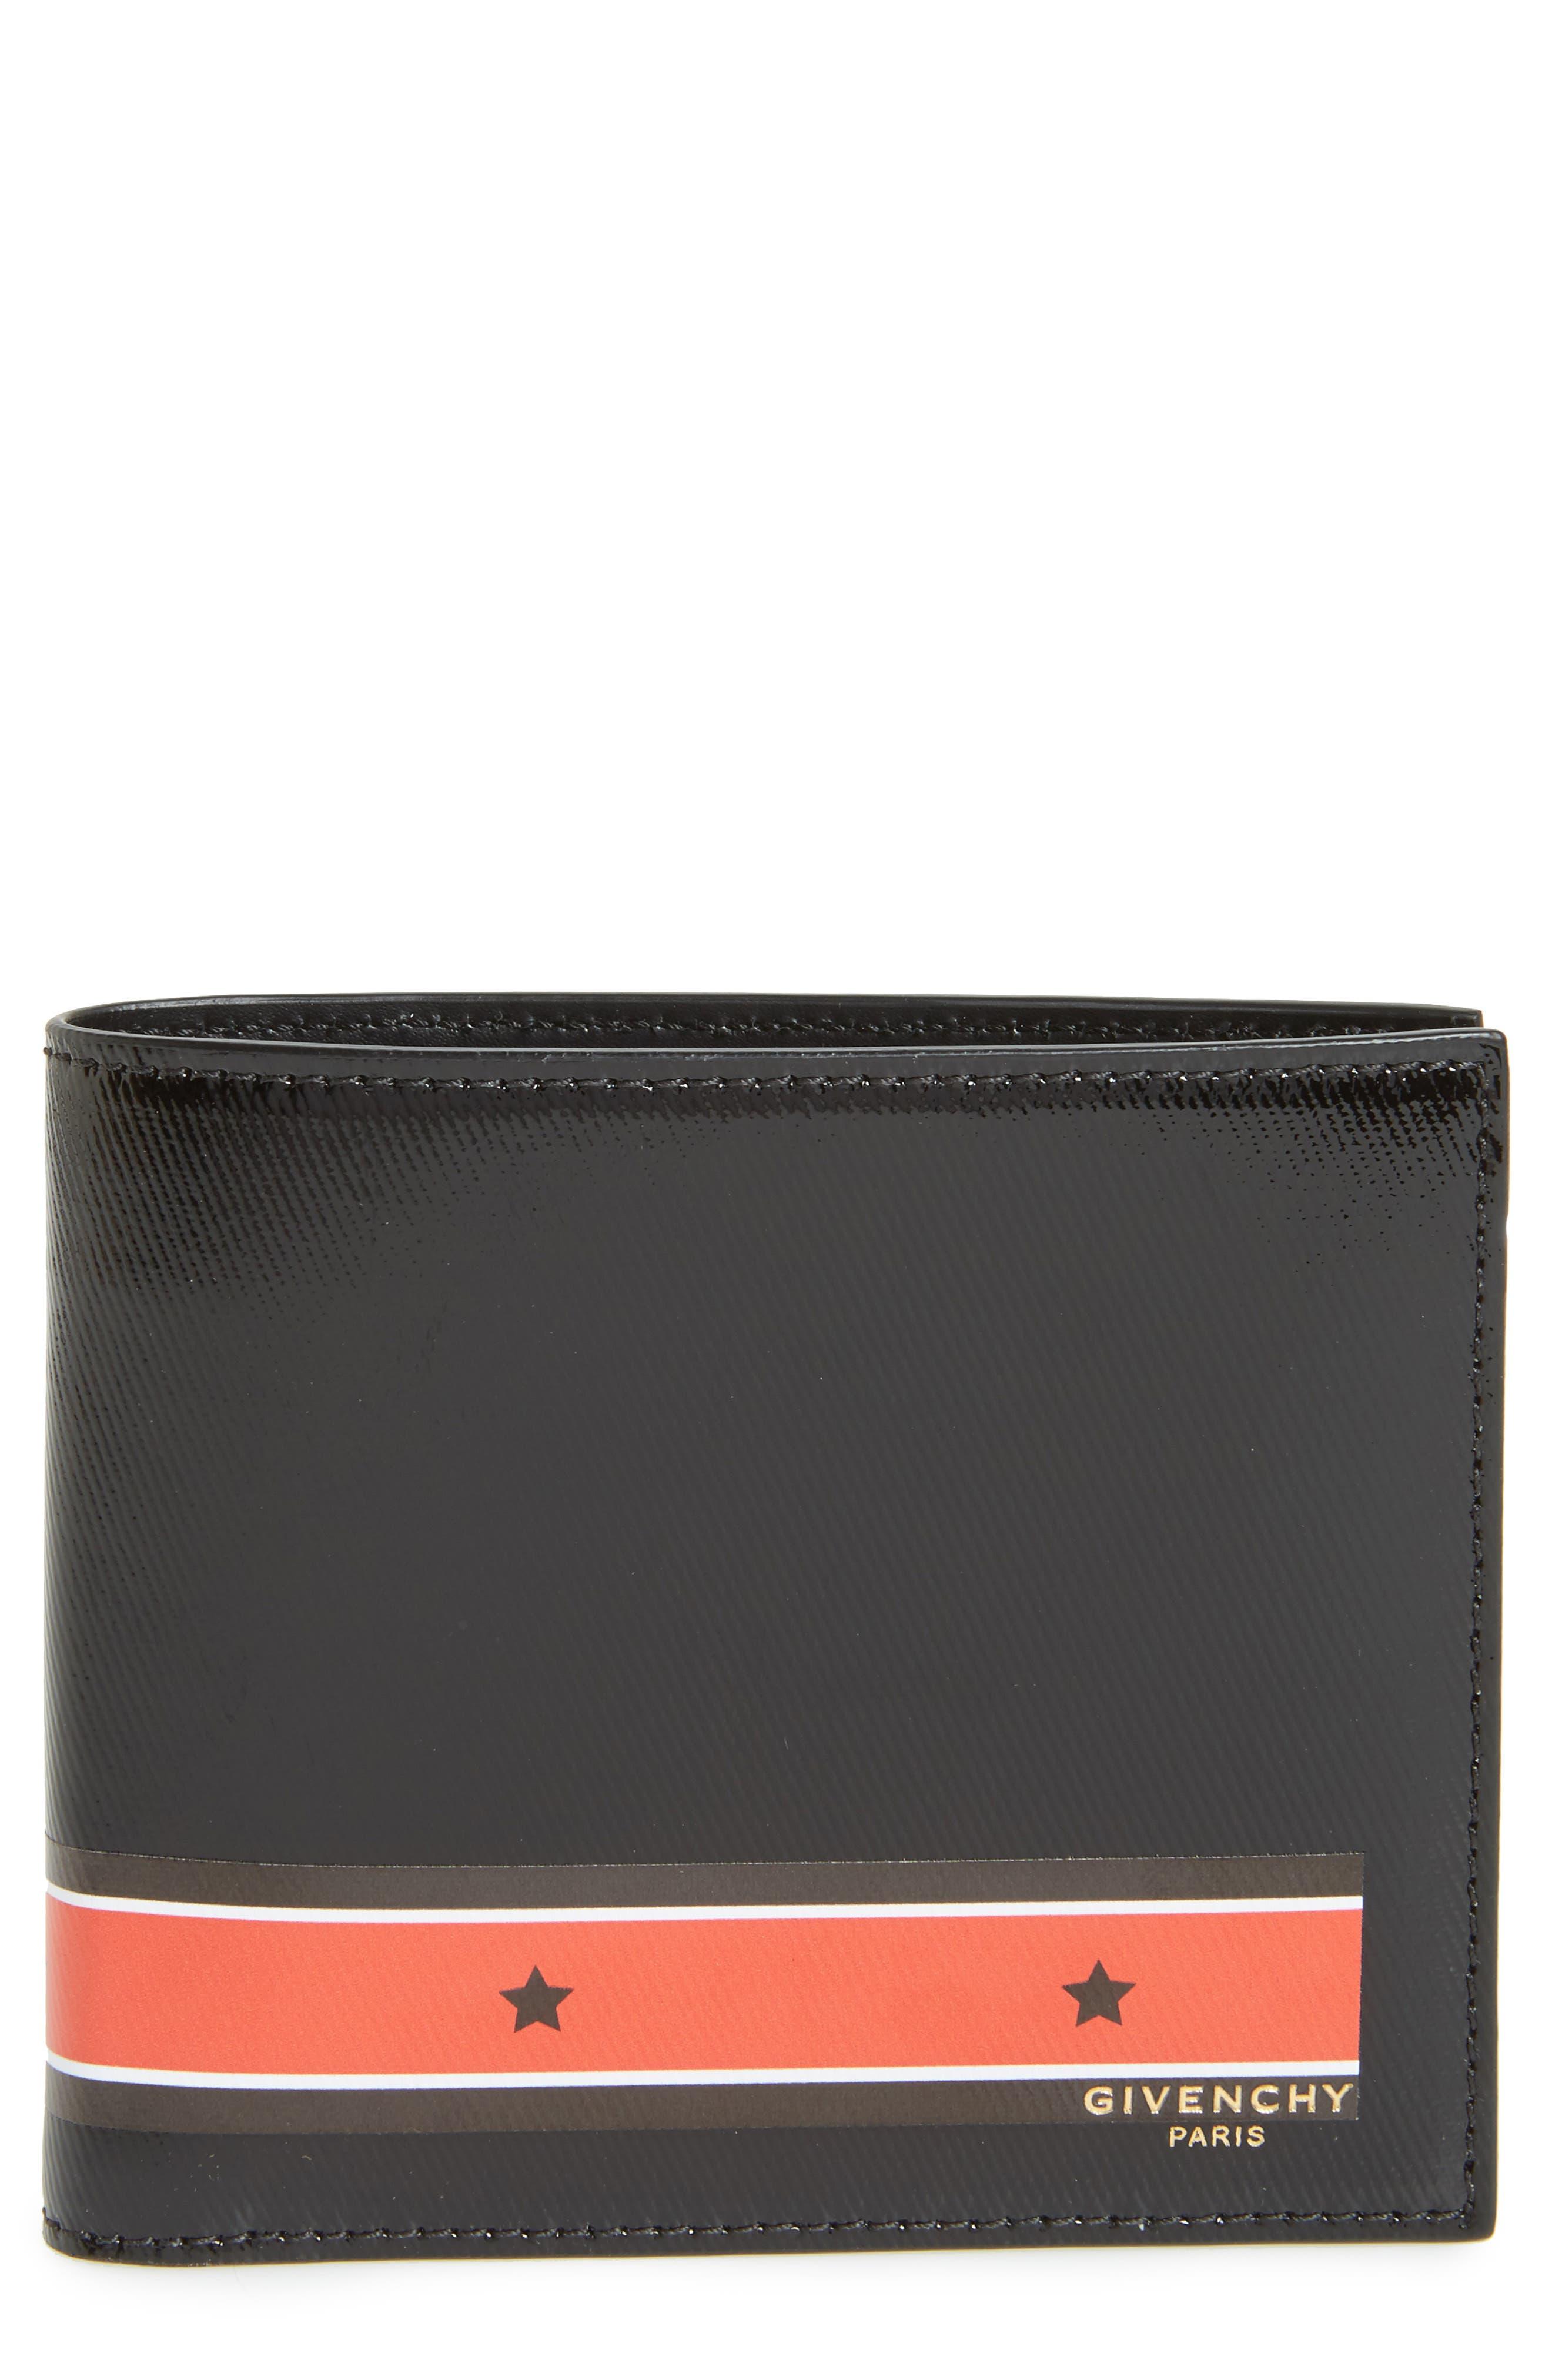 Billfold Wallet,                         Main,                         color, Black/ Red